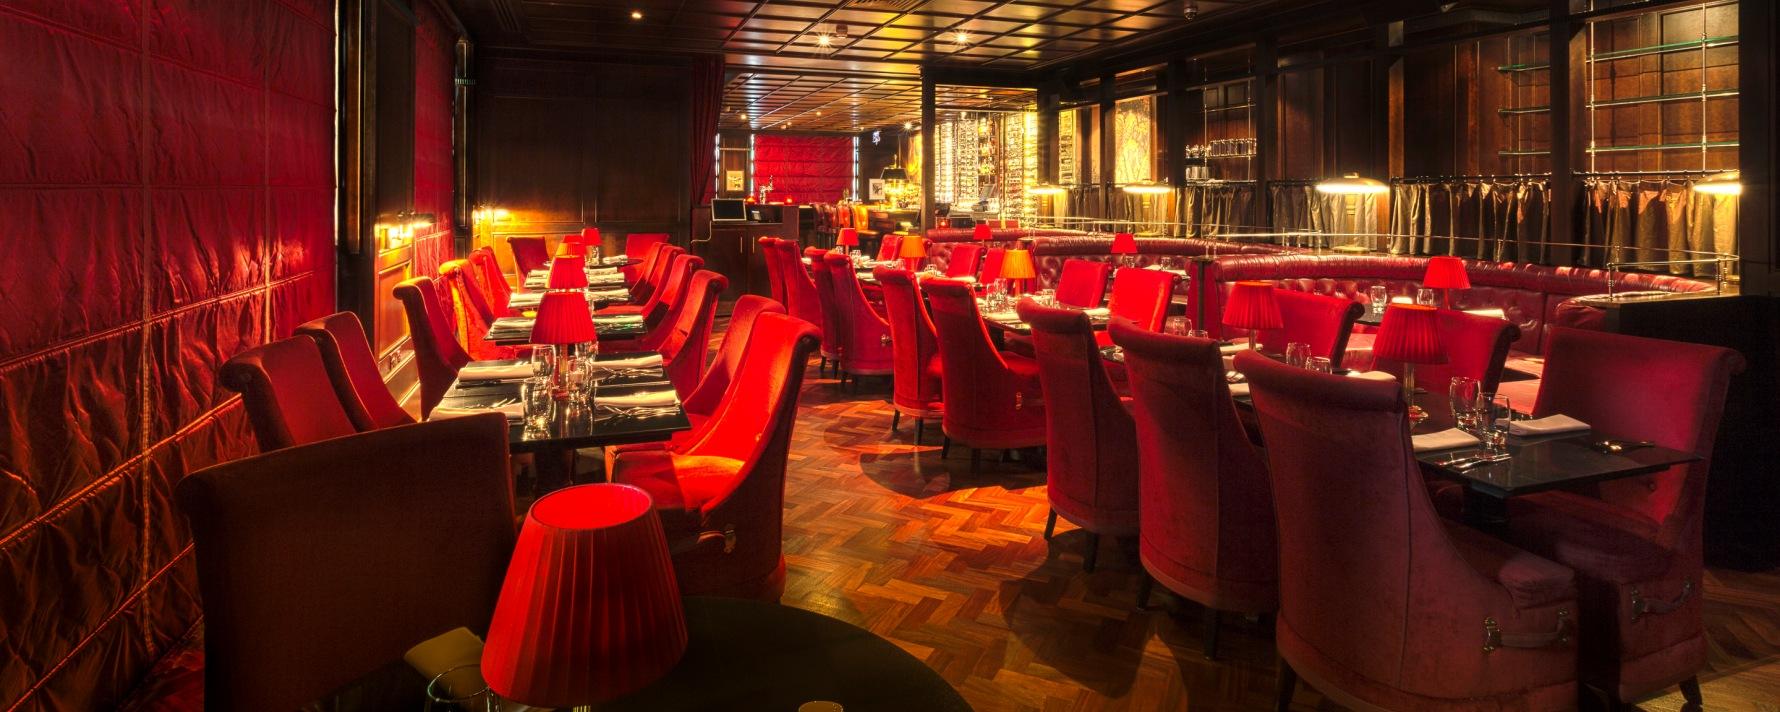 Berts_-_Slider_5_-_Restaurant_View.jpg